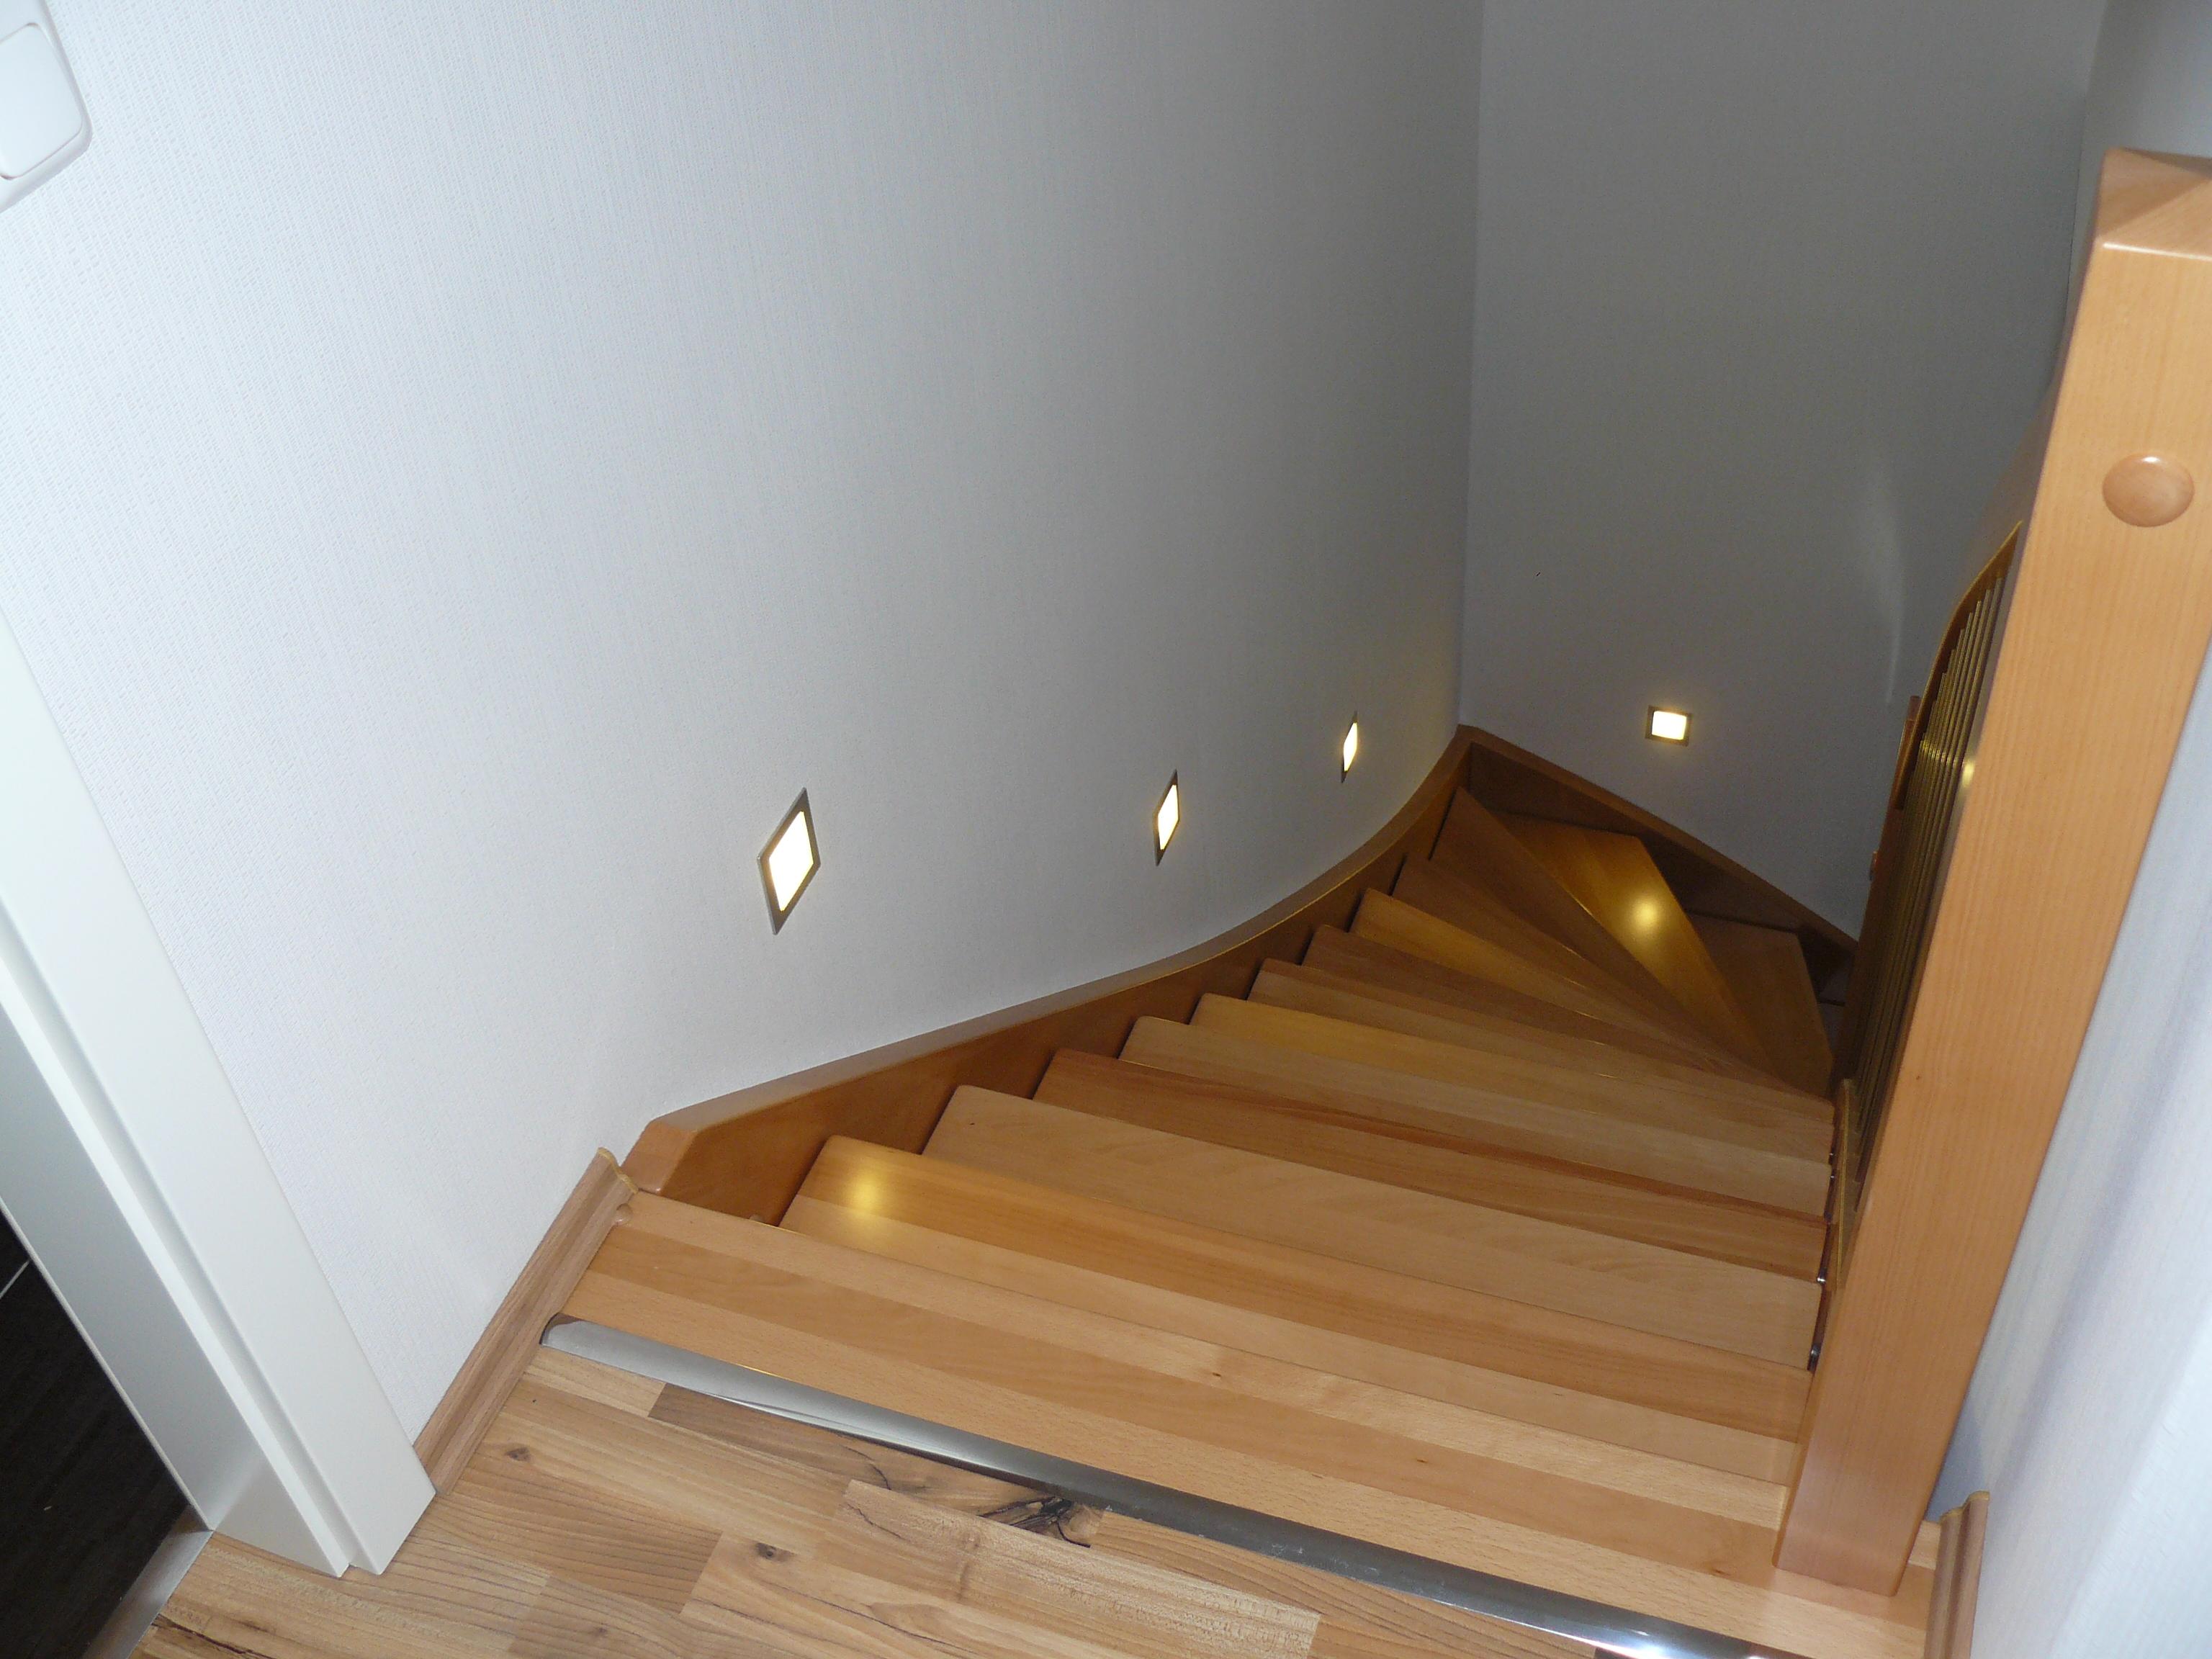 bautagebuch fronhoven elektroinstallation. Black Bedroom Furniture Sets. Home Design Ideas